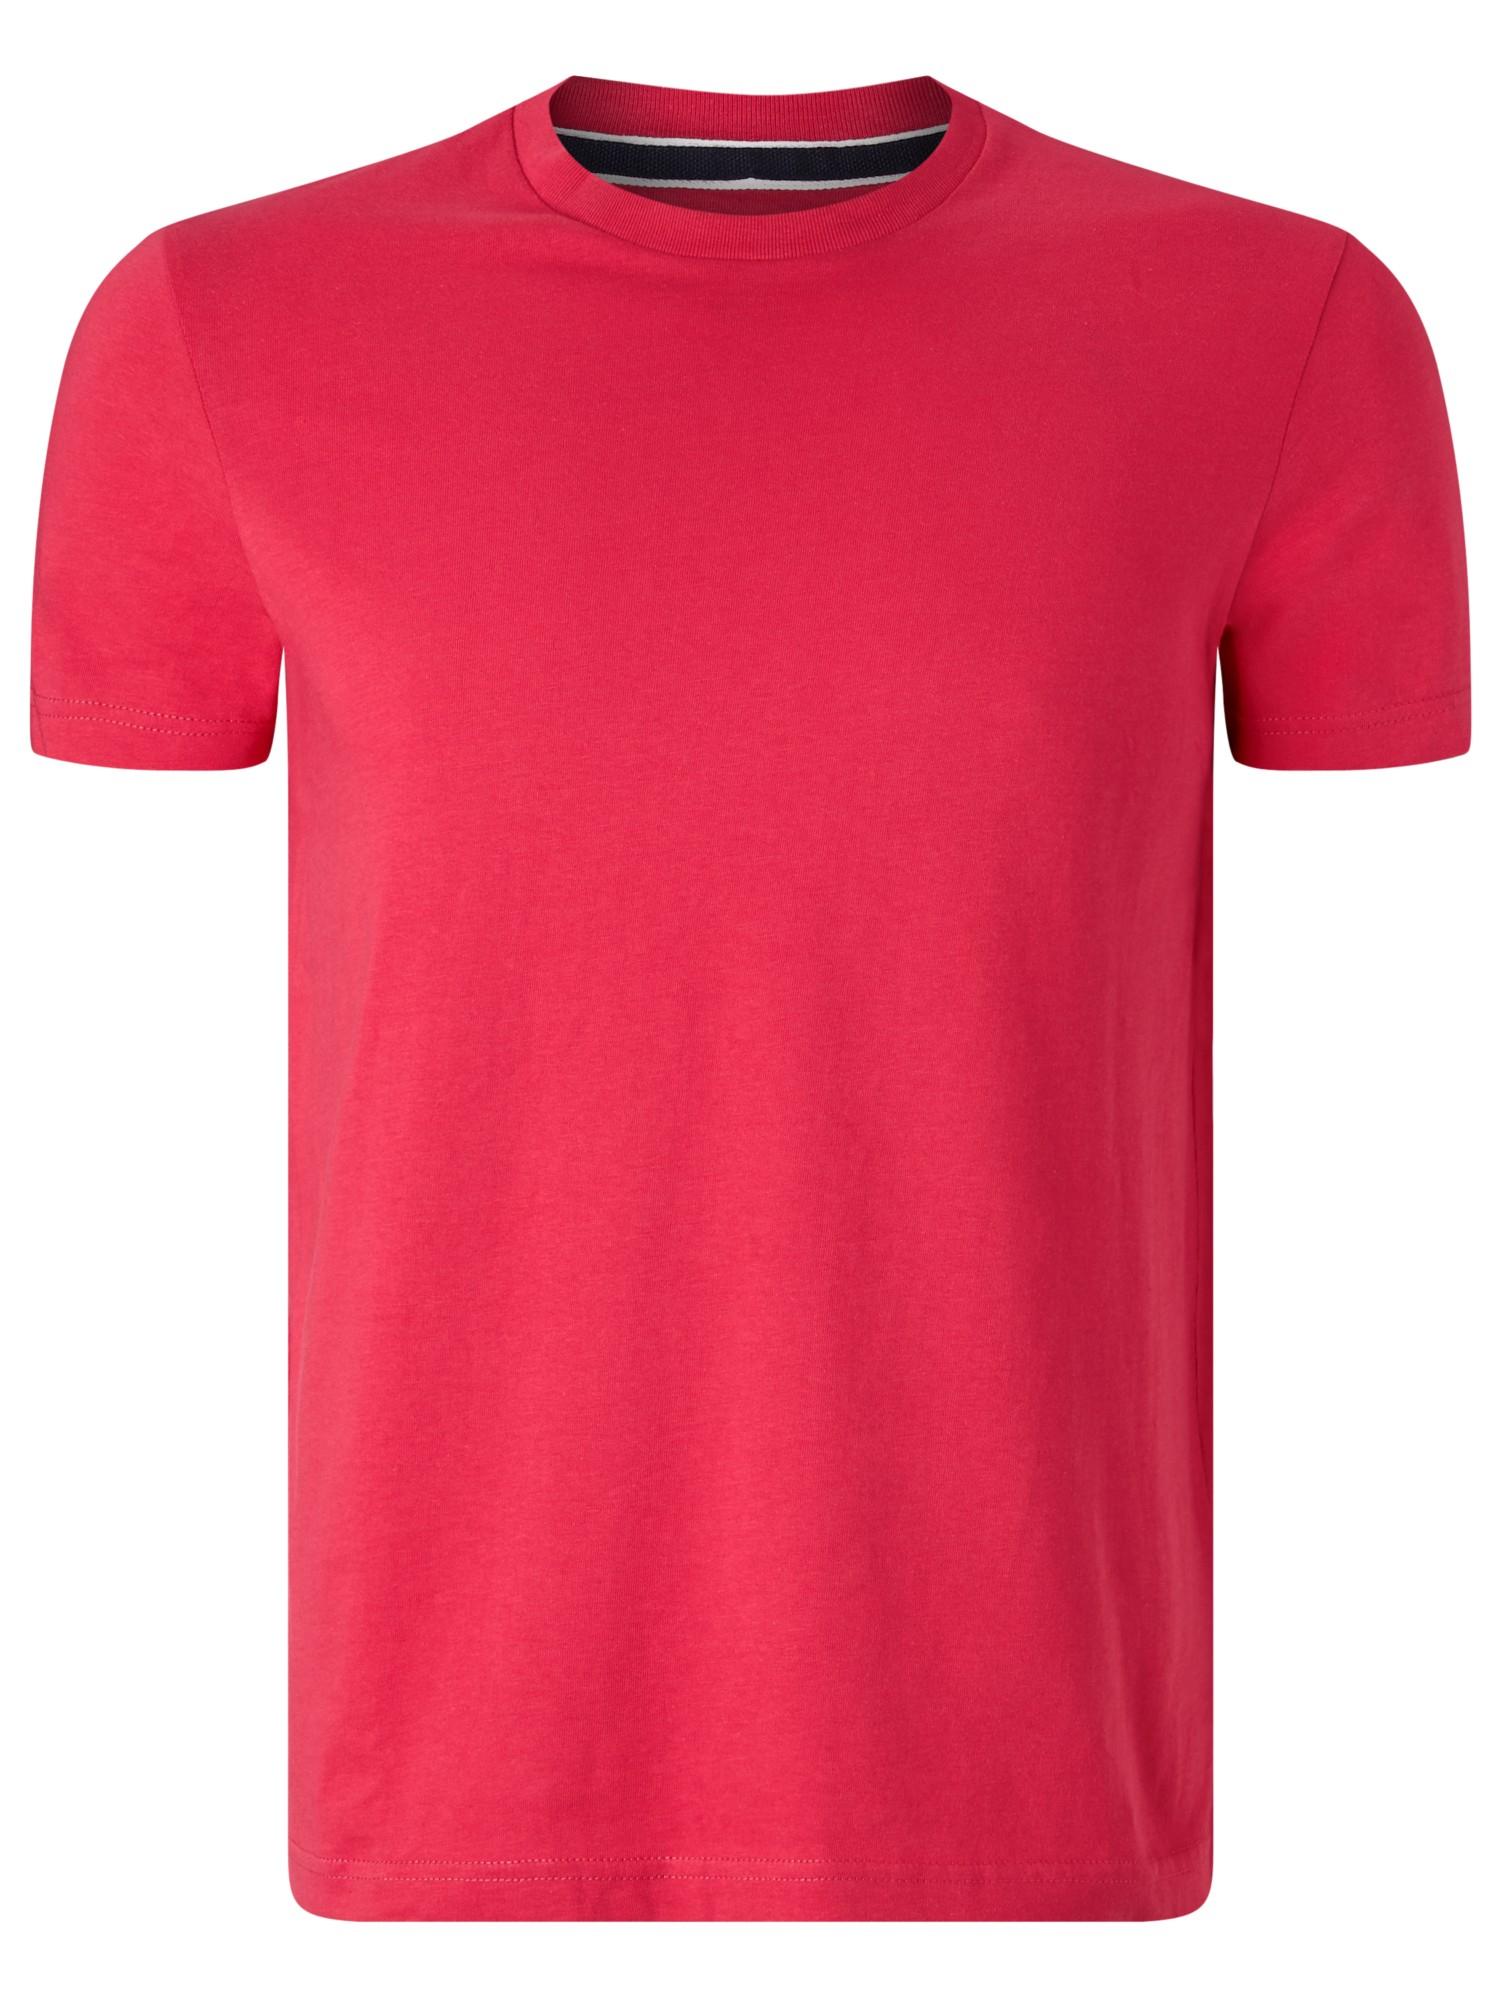 john lewis organic cotton t shirt in black for men lyst. Black Bedroom Furniture Sets. Home Design Ideas